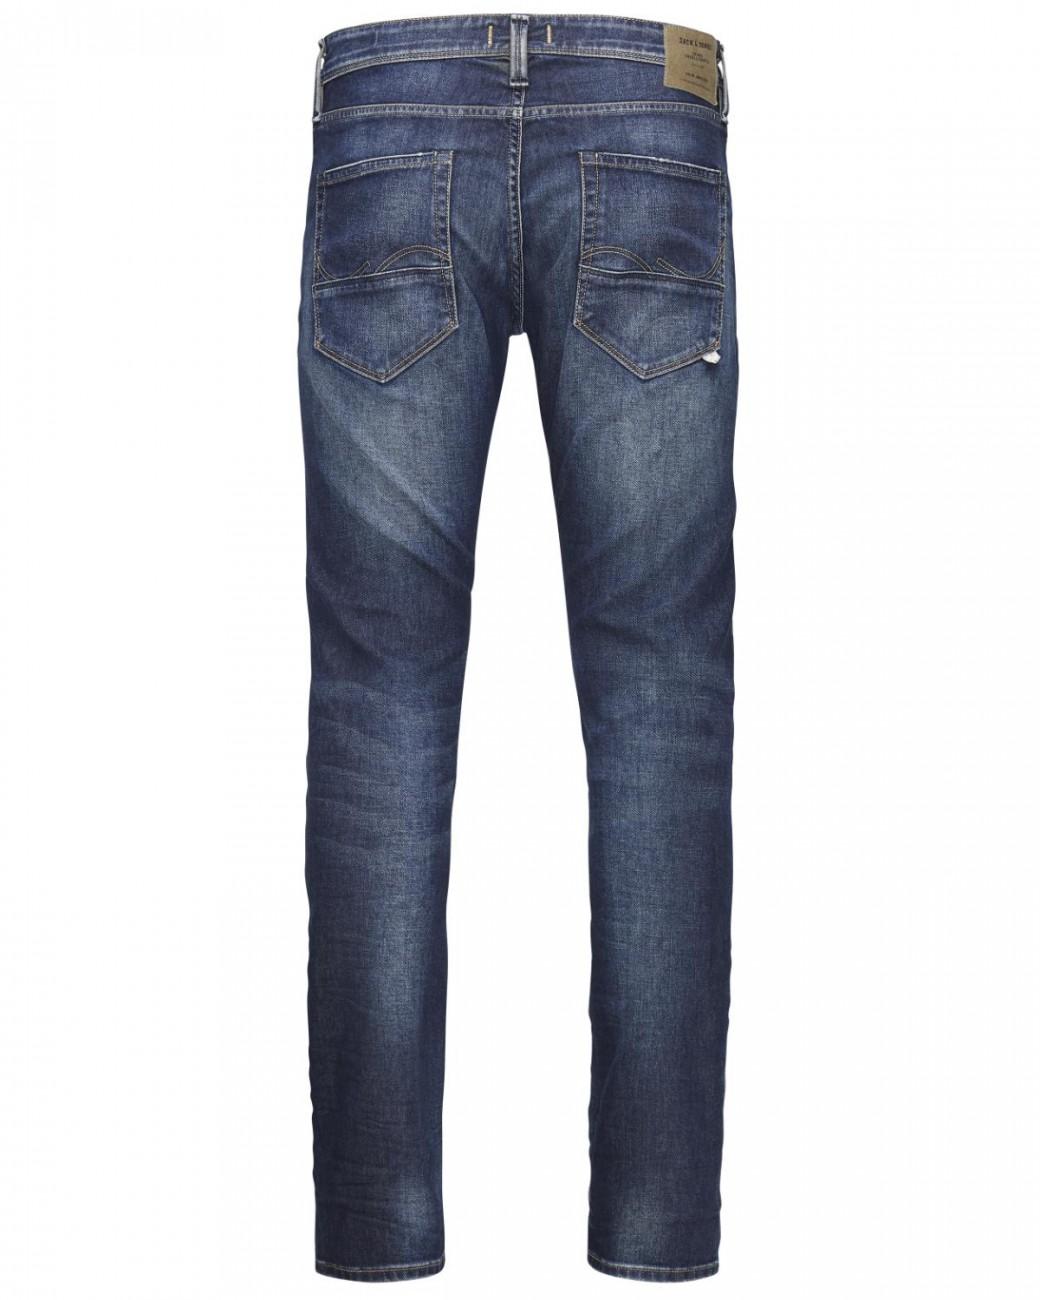 jack-jones-herren-jeans-jjiglenn-jjfox-bl-669-indigo-knit-slim-fit-blau-blue-denim